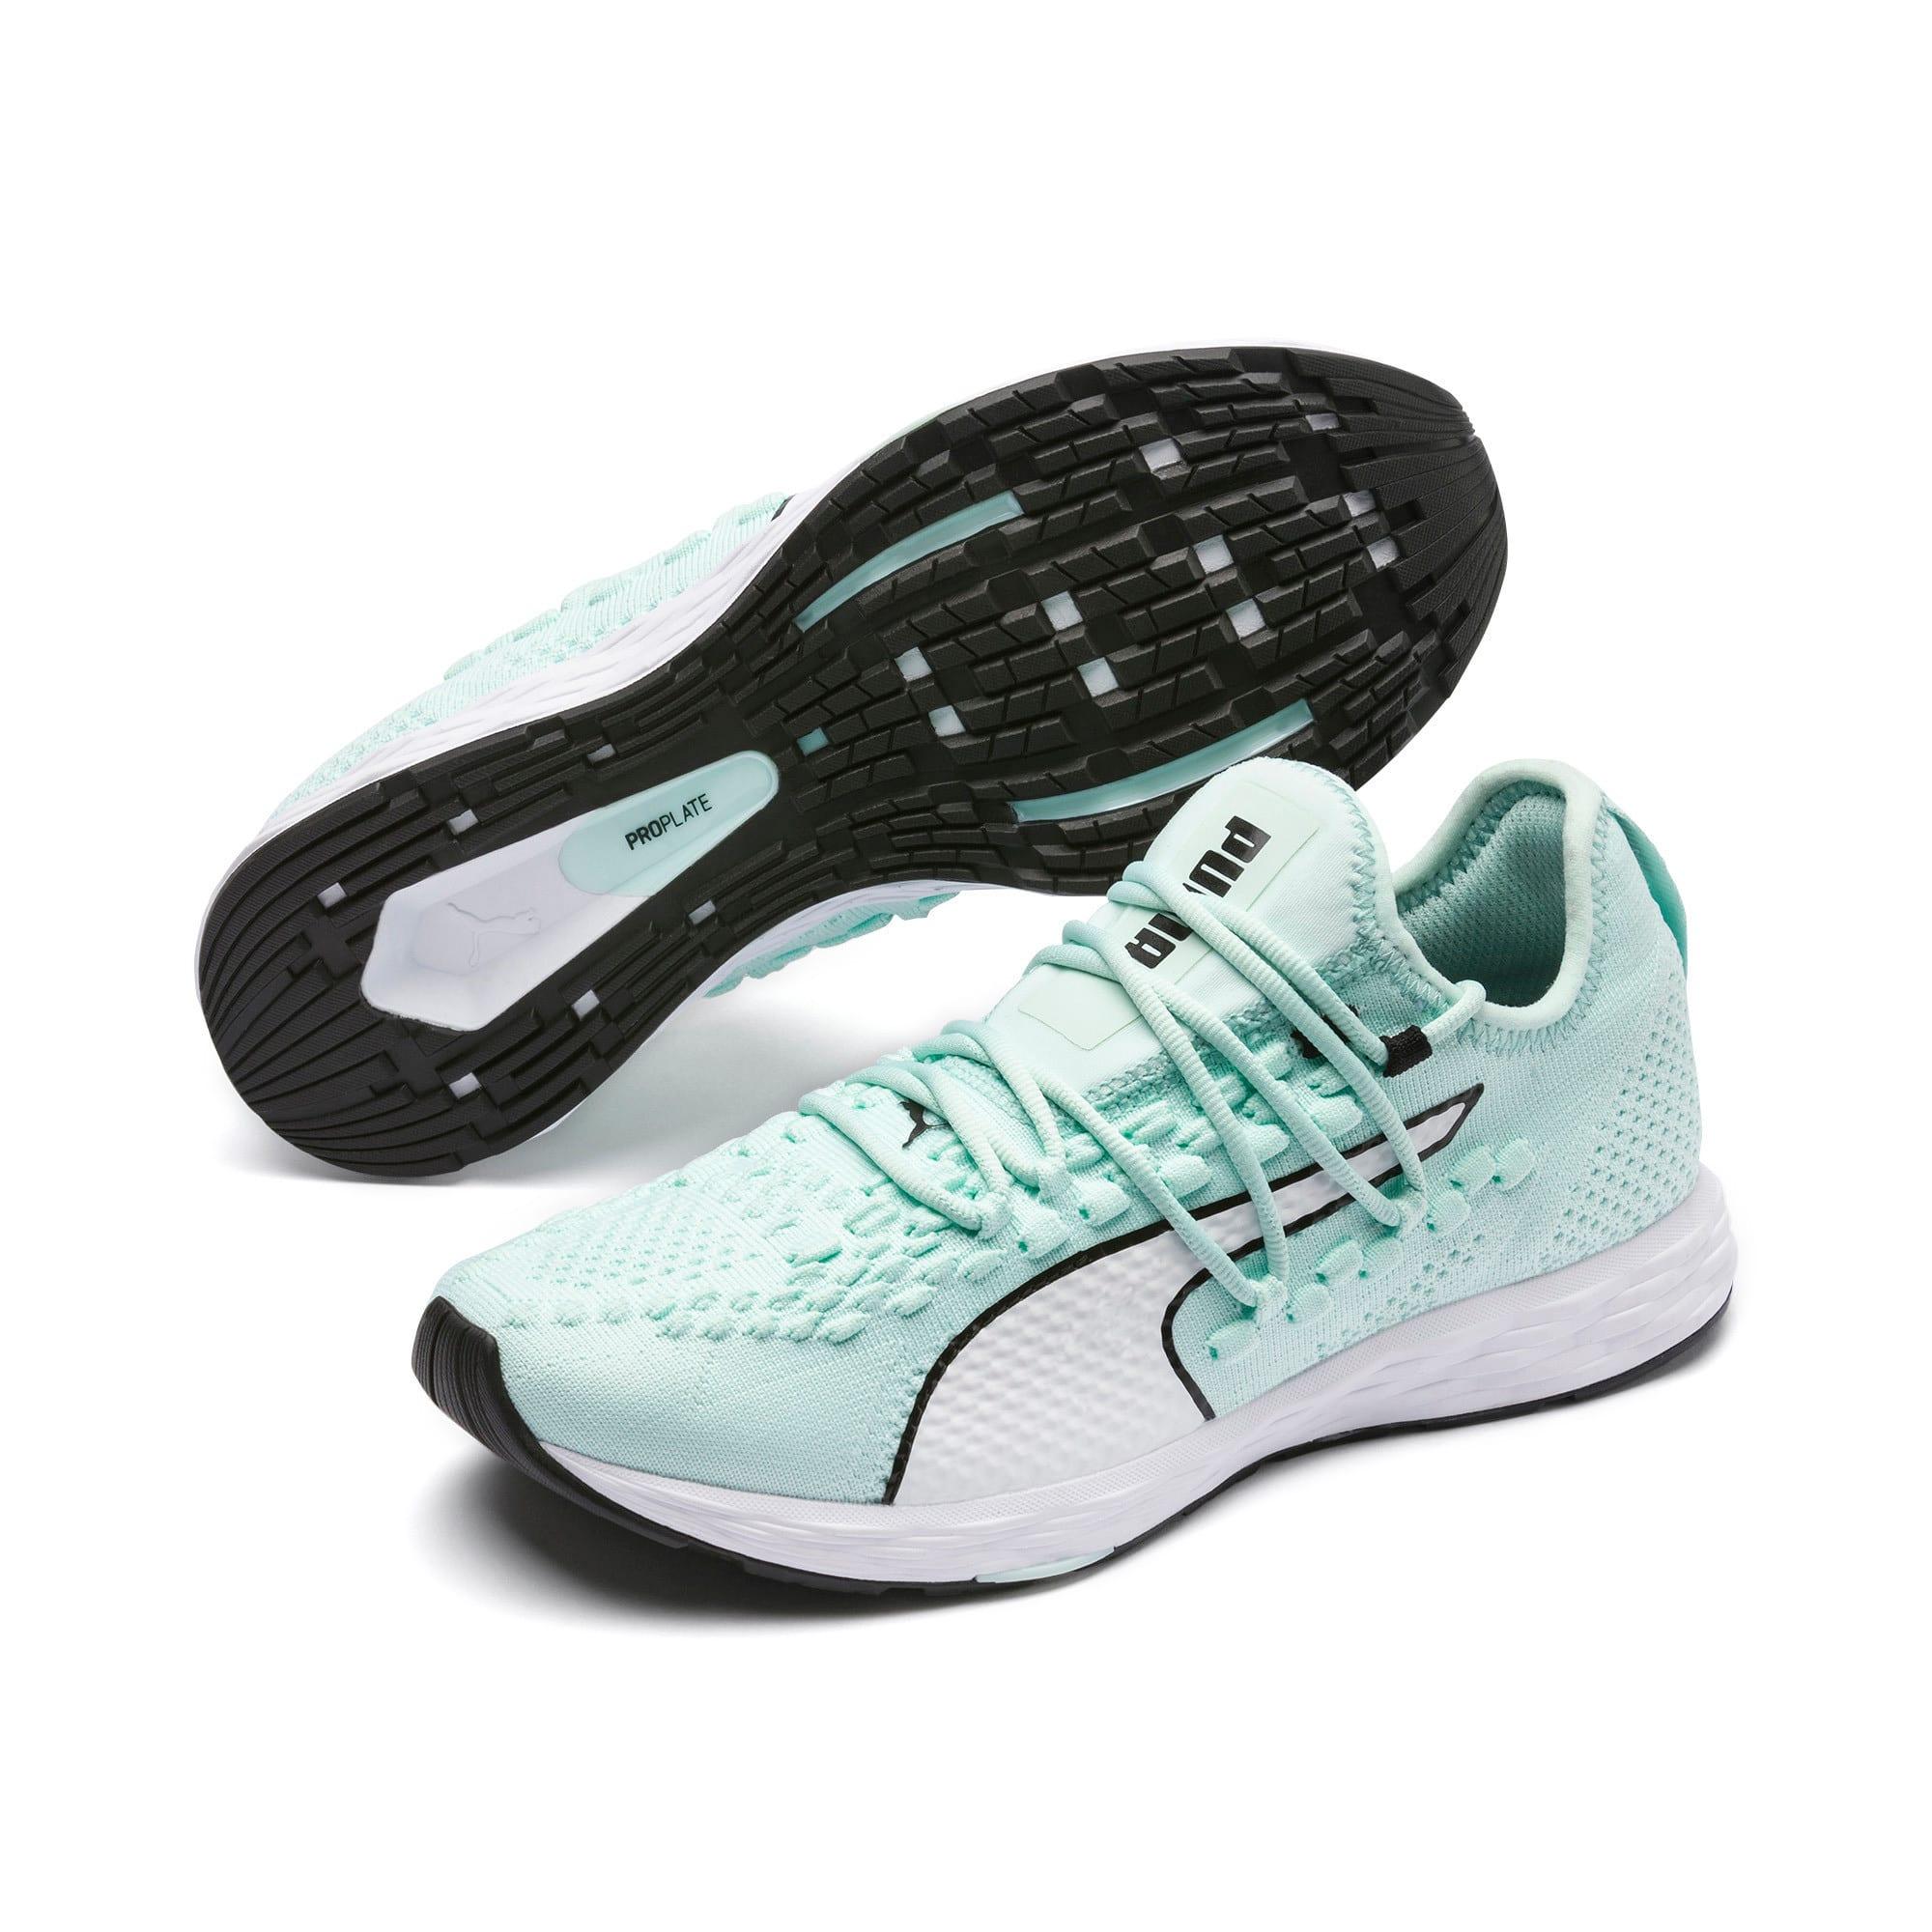 Thumbnail 2 of SPEED 300 RACER Women's Running Shoes, Fair Aqua-White-Black, medium